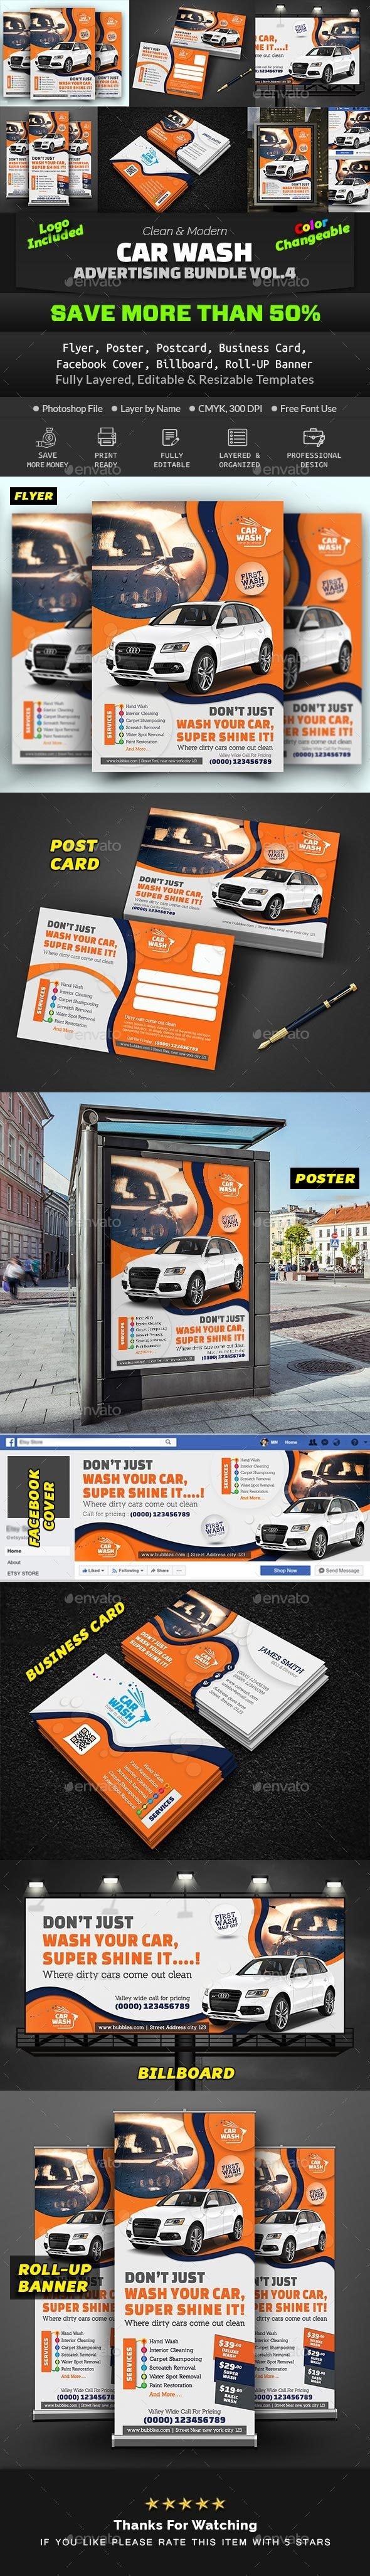 Car Wash Advertising Bundle Vol. 4 - Print Templates